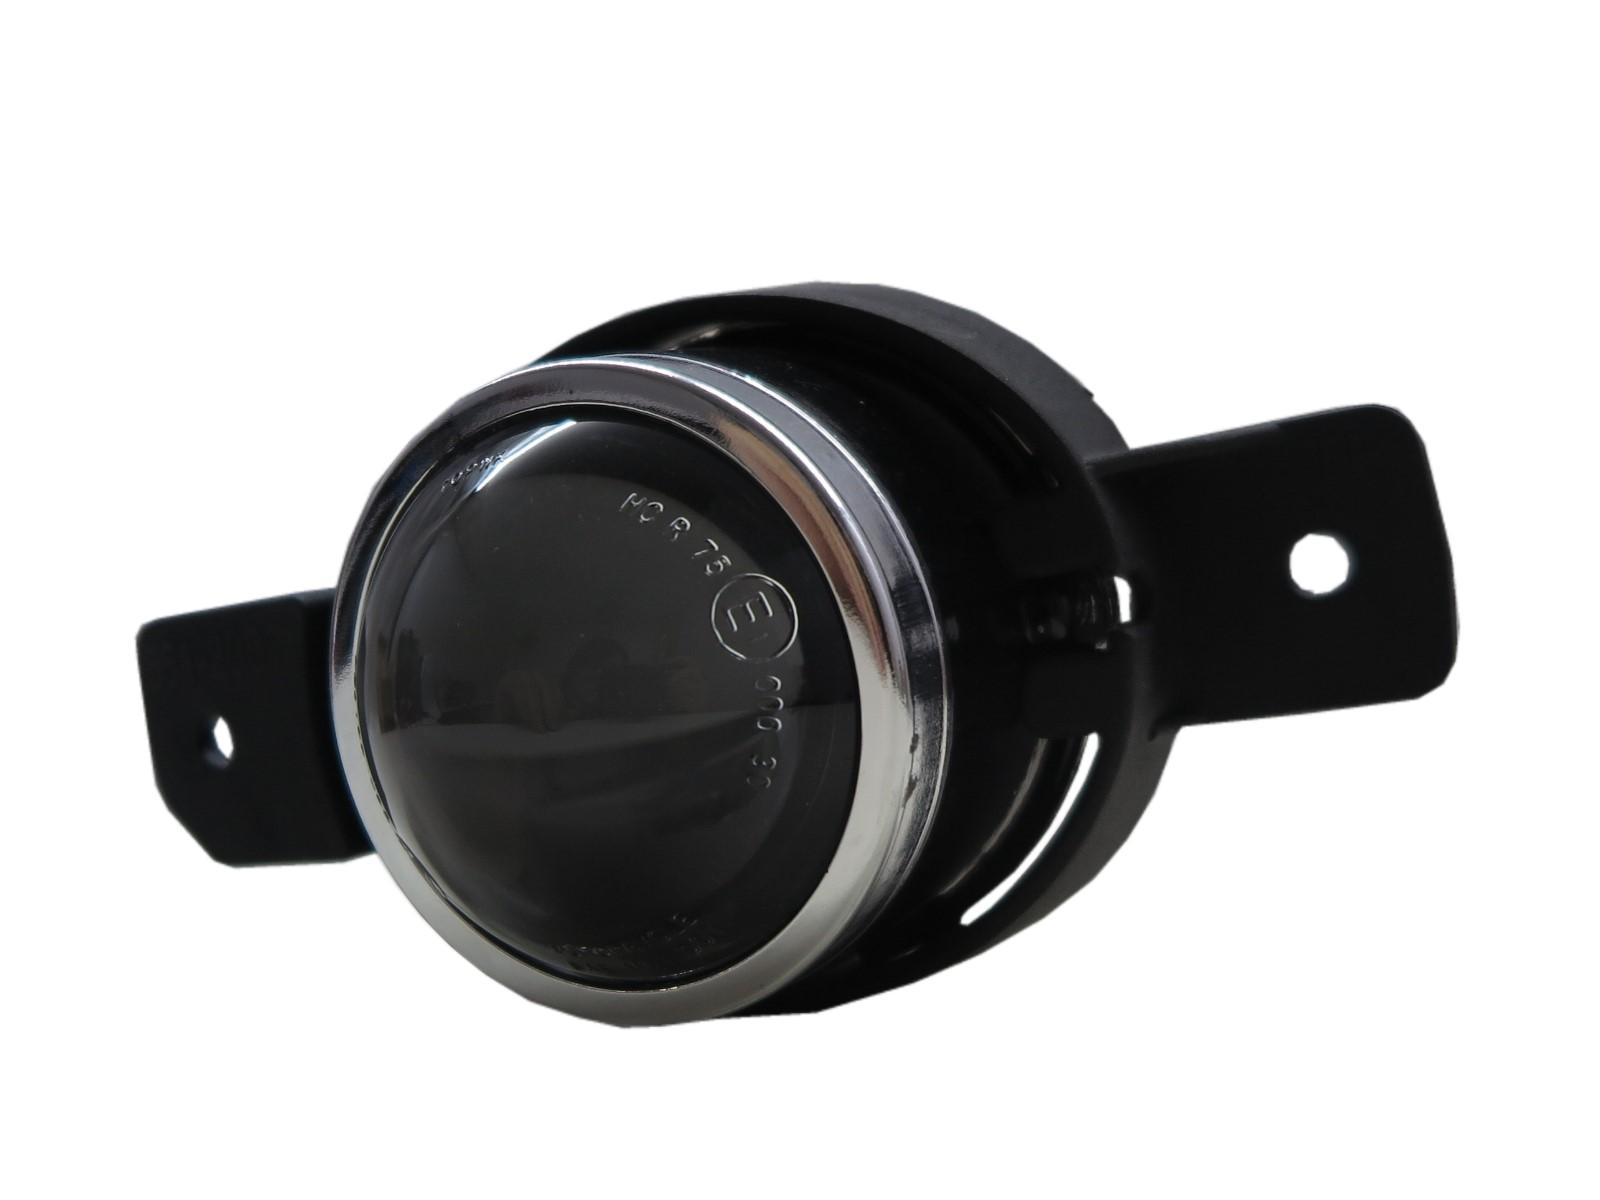 thumbnail 2 - NV400 2010-Present VAN 2D Projector Fog Light Black for NISSAN